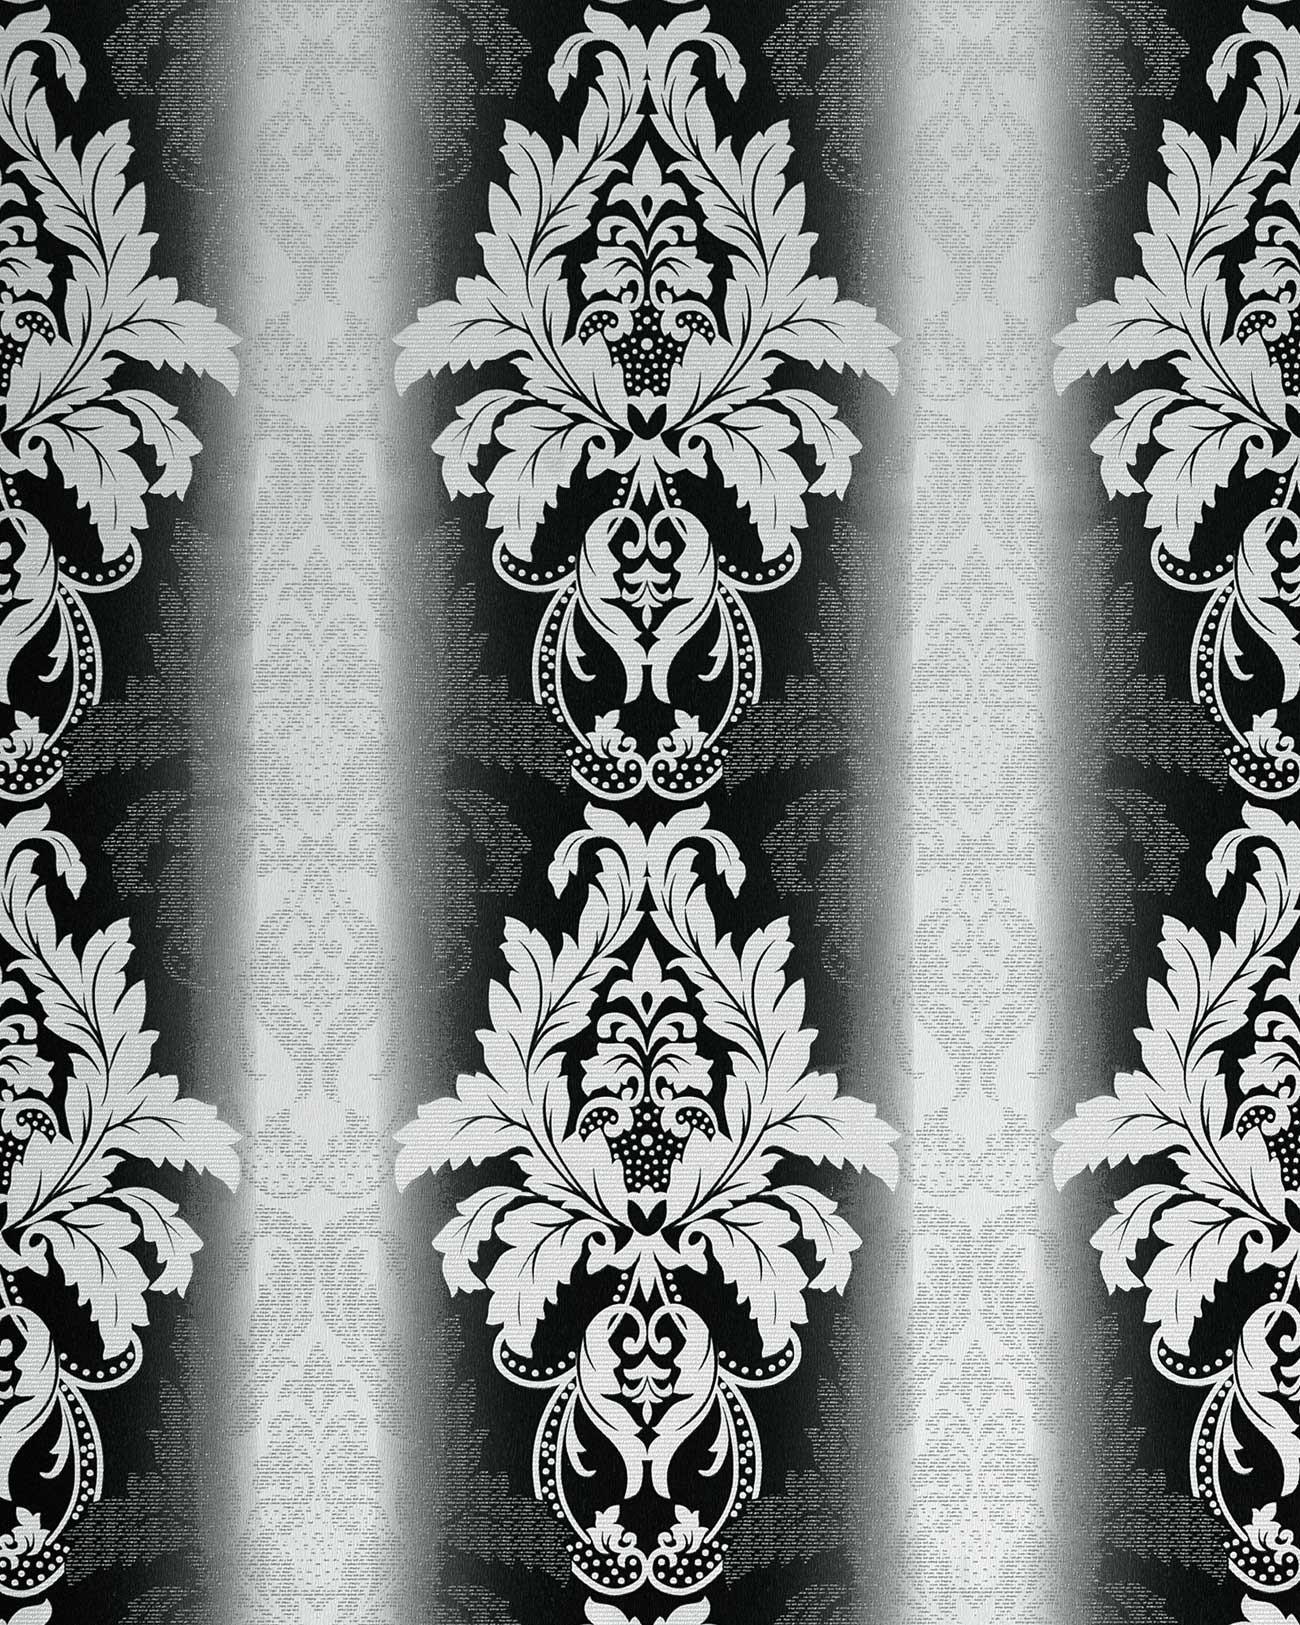 Barock Tapete Schwarz Wei? : Baroque Black and White Damask Wallpaper